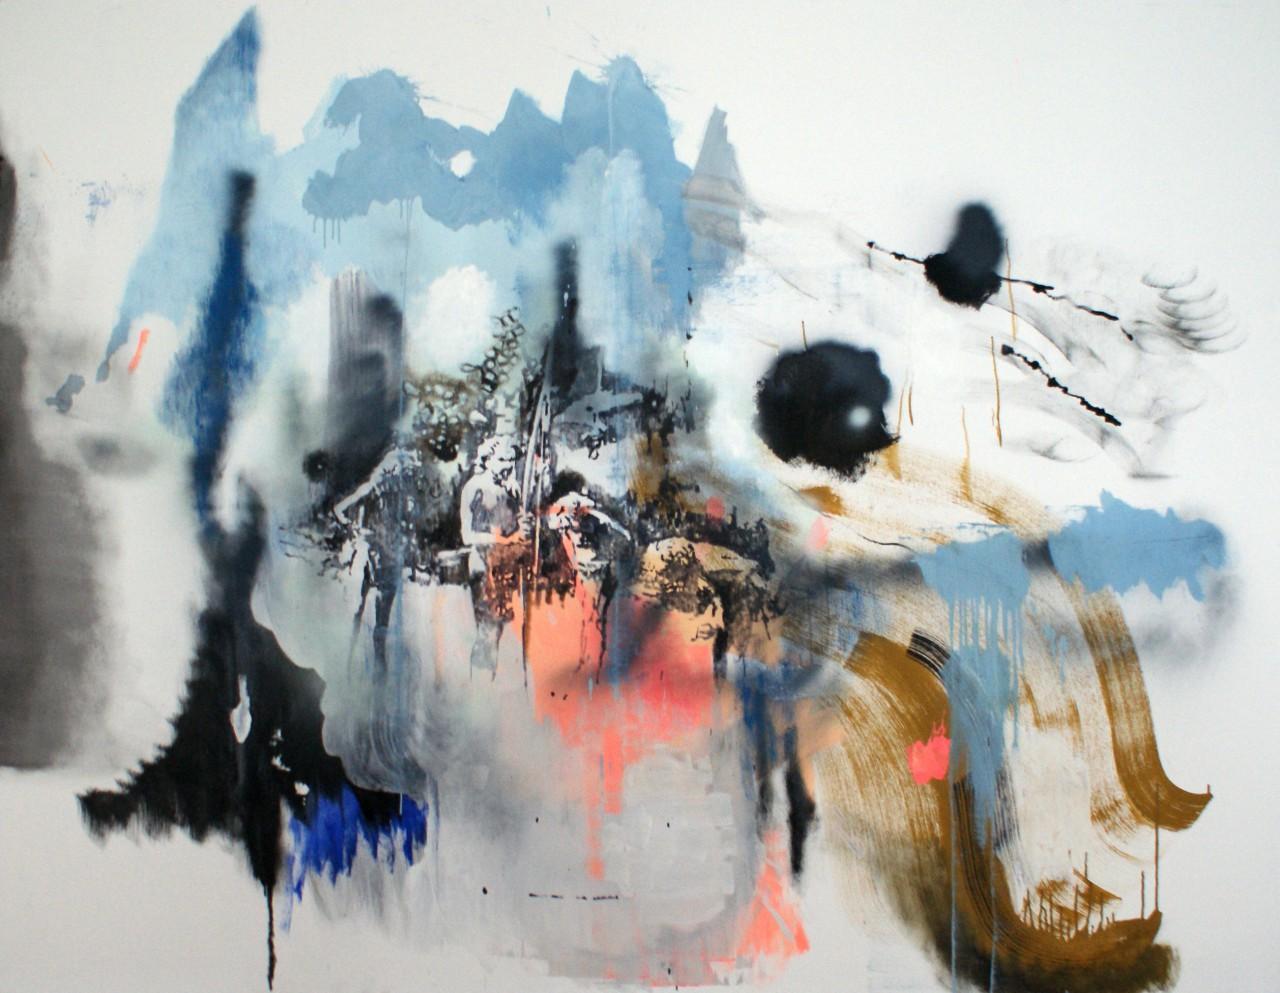 """INNATURA"", Eggtempera on canvas, Miriam Vlaming, 2015 II Photo:© Miriam Vlaming"